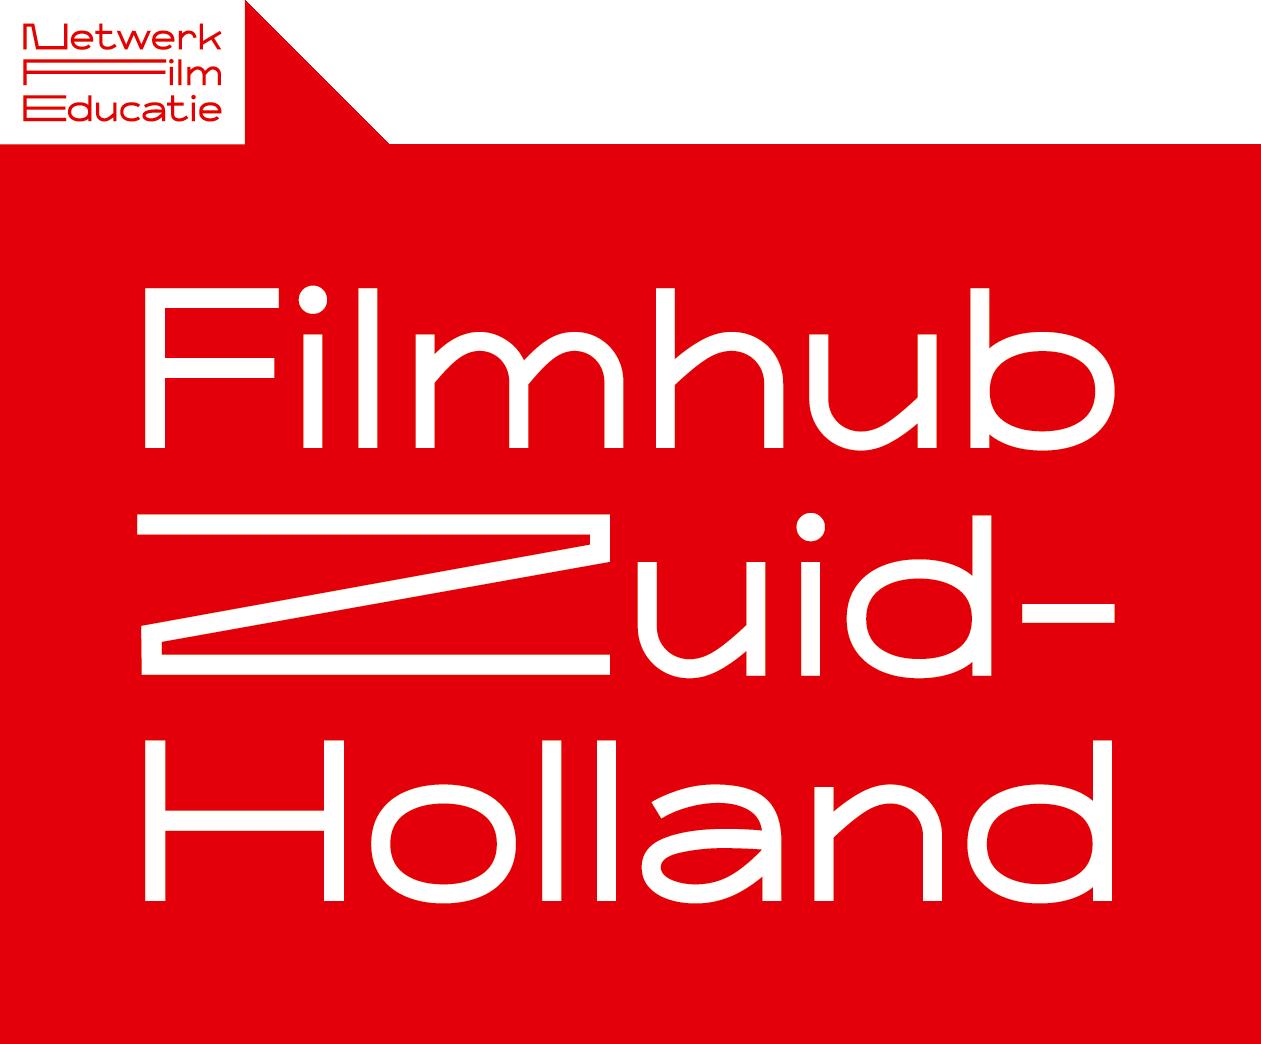 Logo Netwerk film educatie Filmhub Zuid-Holland